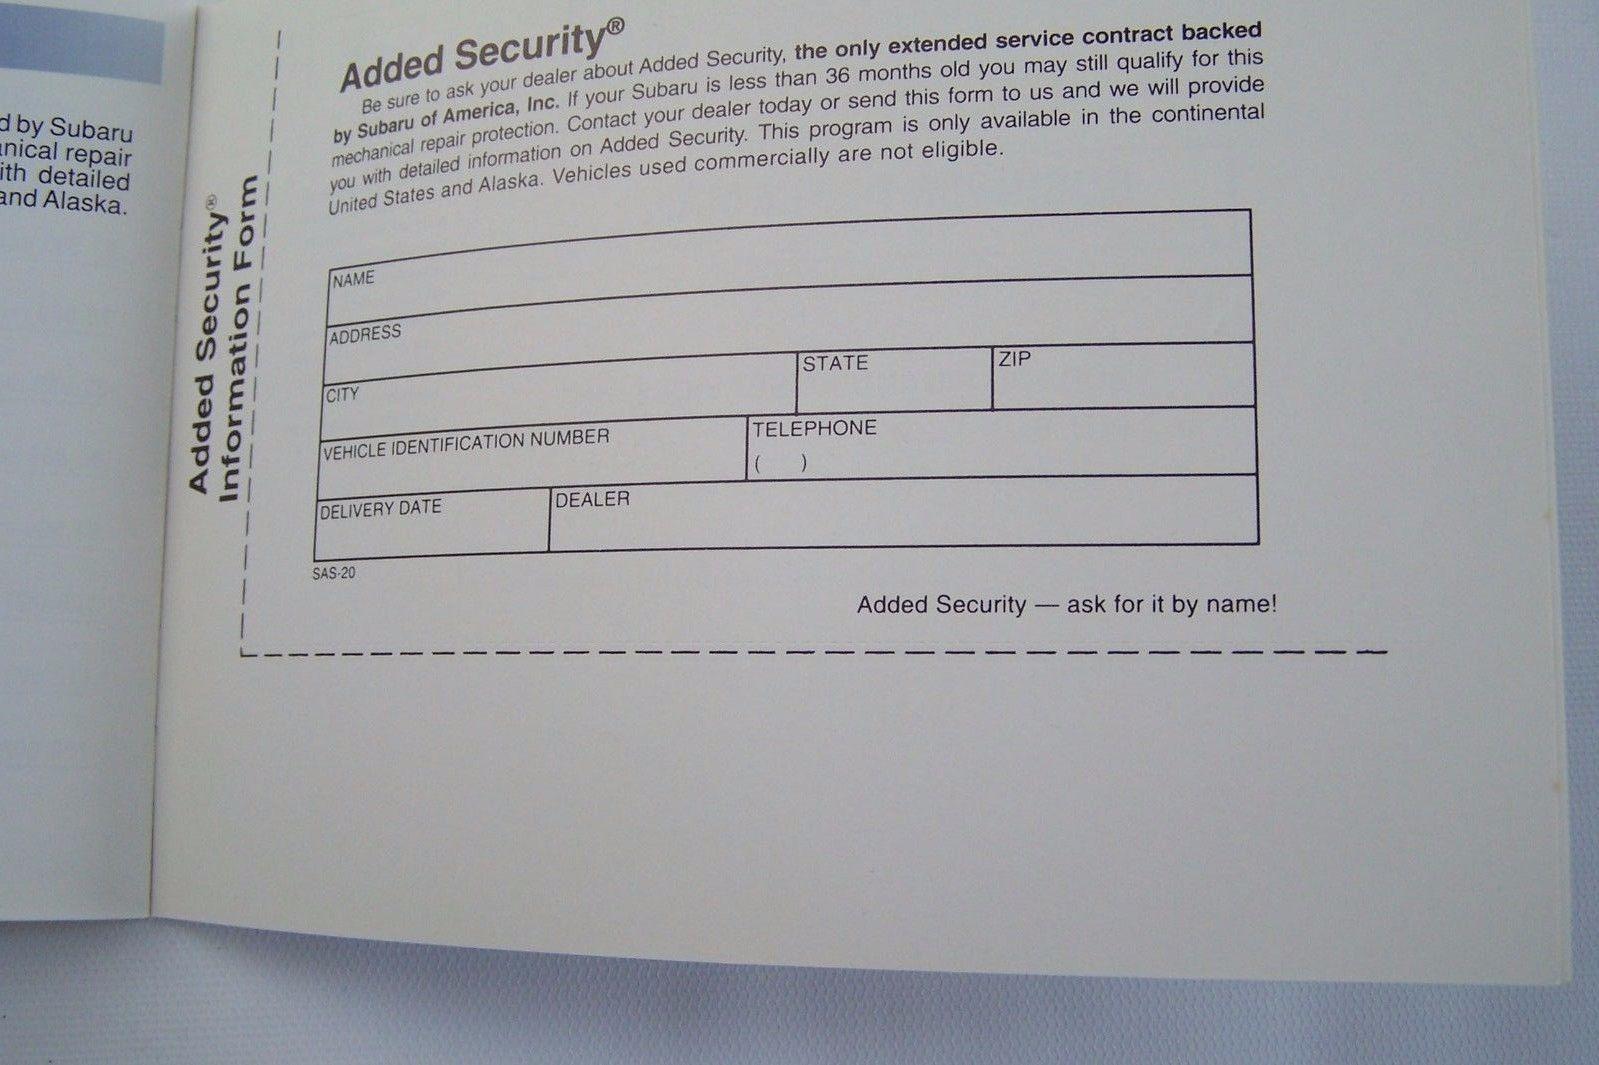 2002 subaru forester legacy impreza wrx owners maintenance schedule warranty